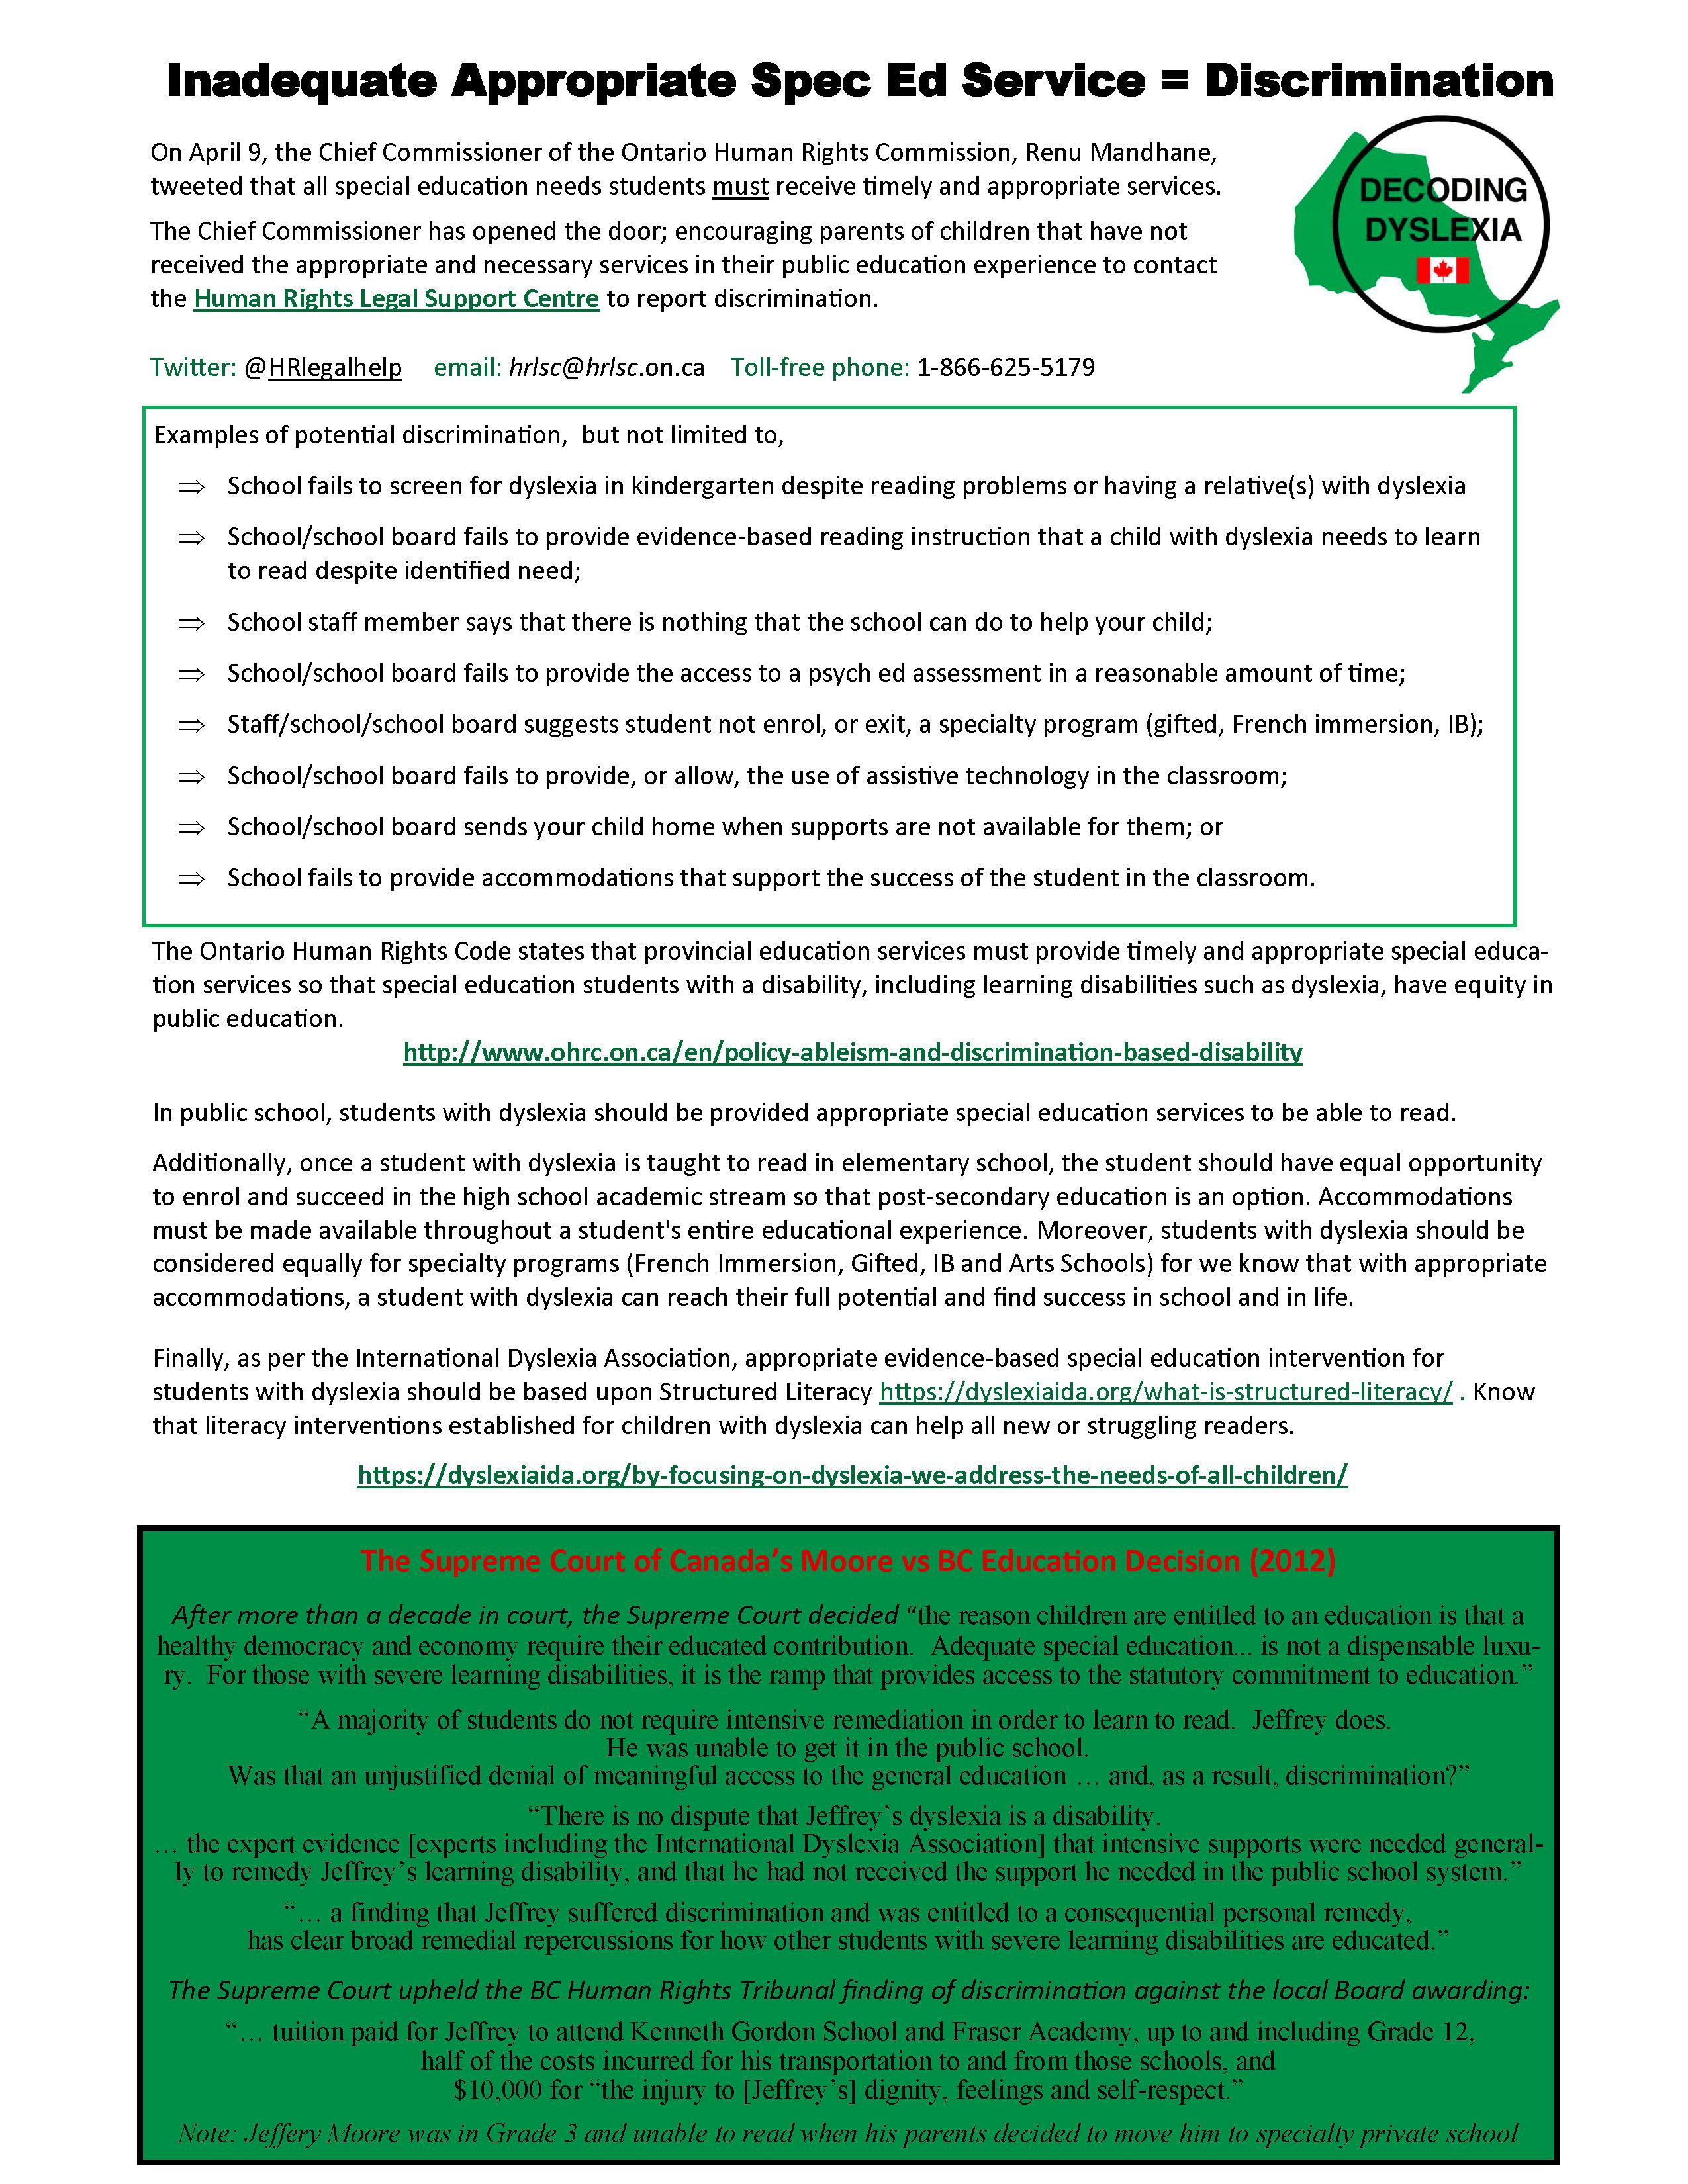 OHRCPostv4_pdf